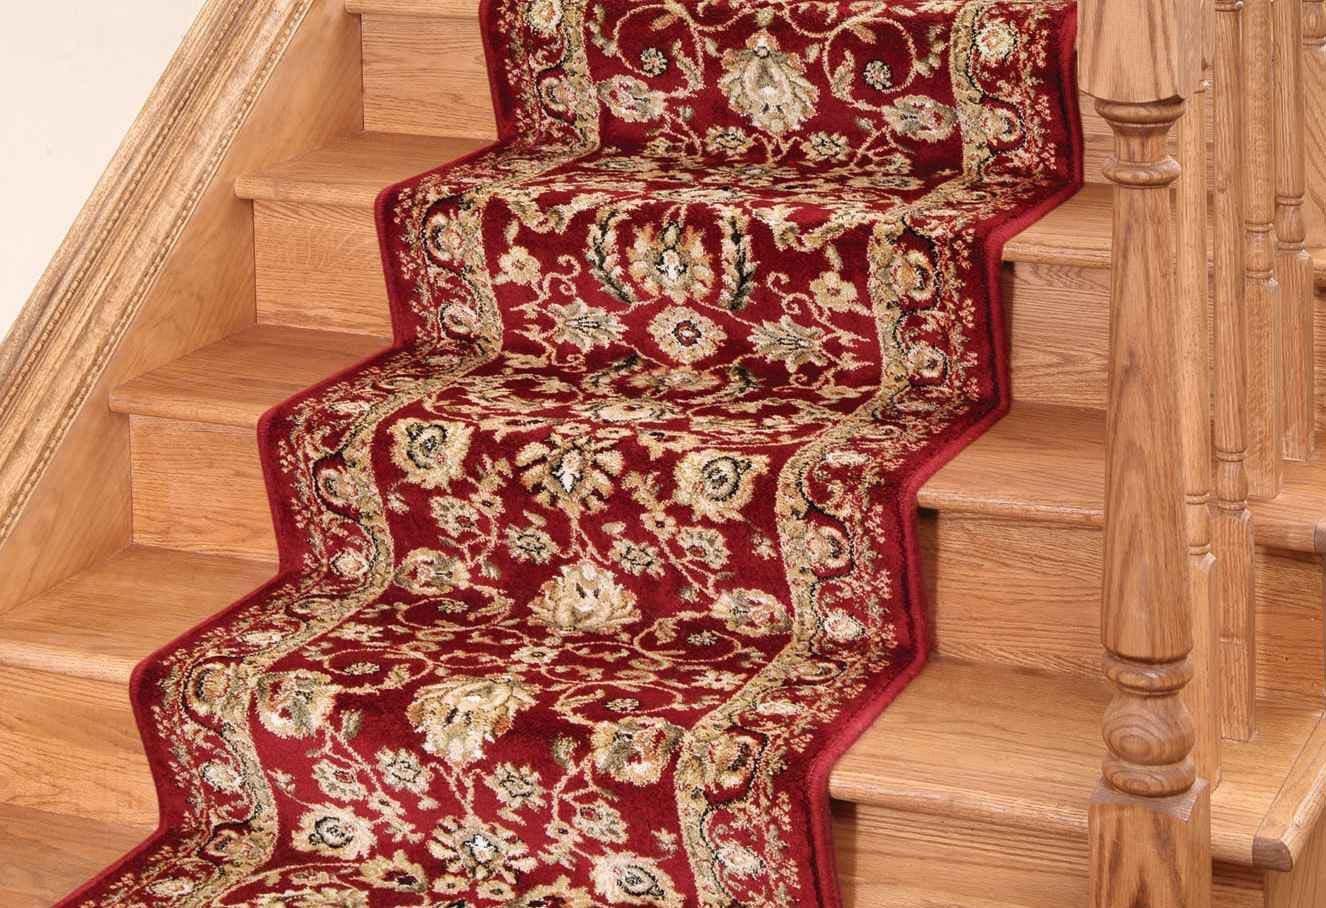 Oriental Carpet Stair Treads Stair Runner Carpet Carpet Stairs Carpet Stair Treads